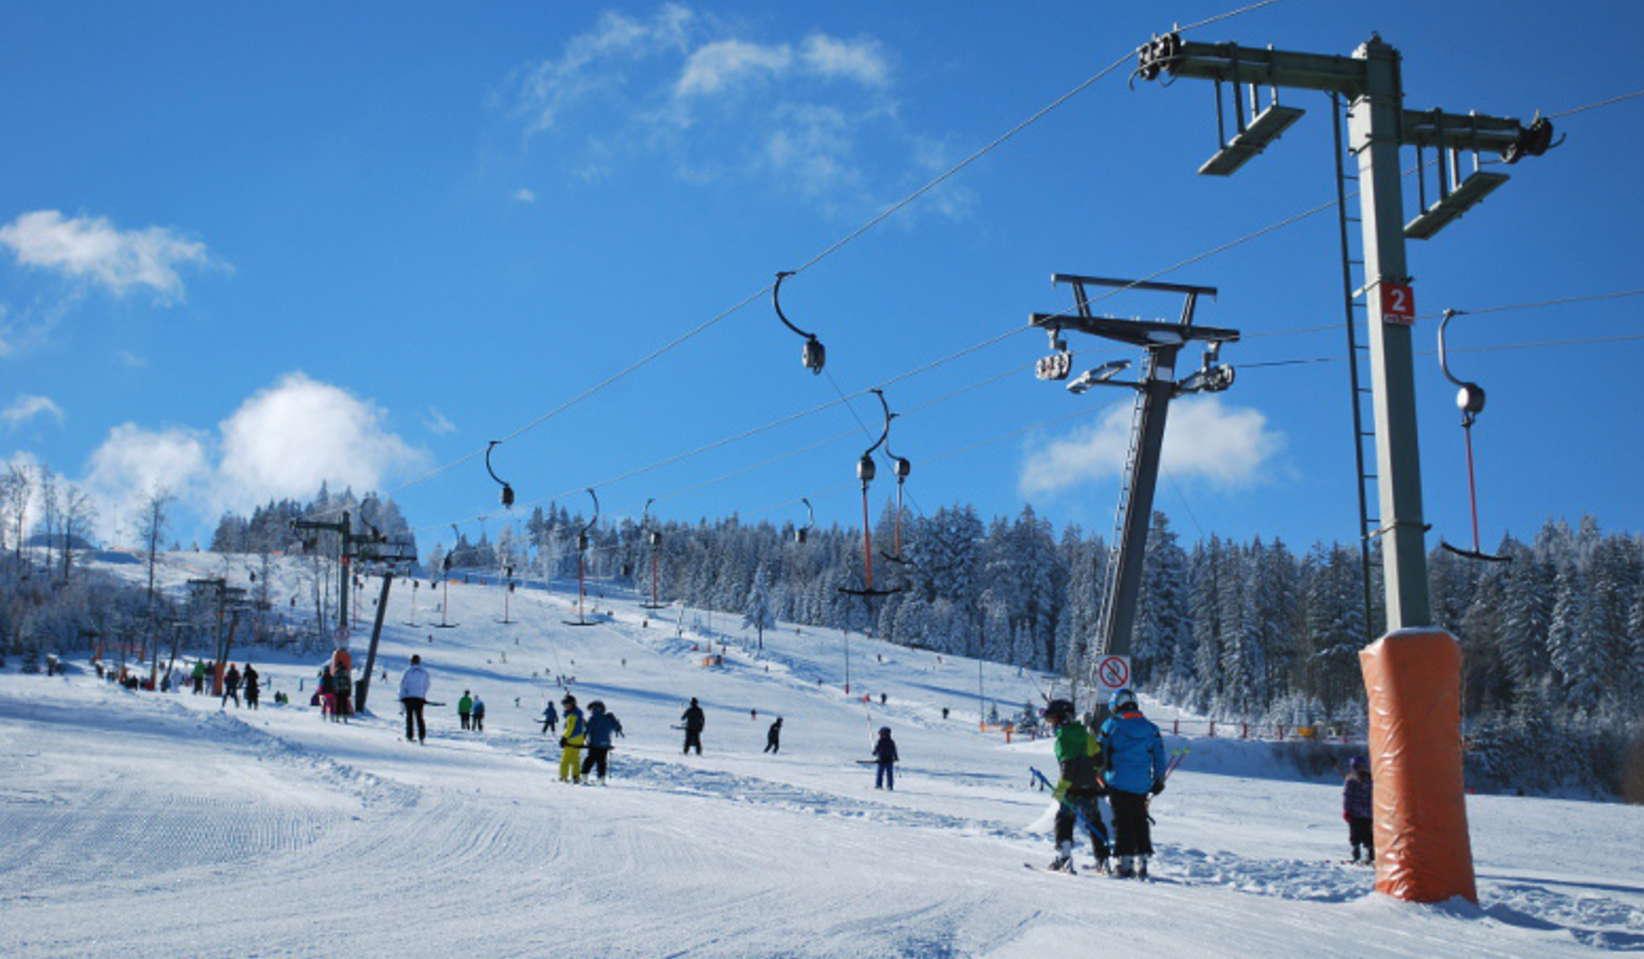 Skigebiet Gei 223 Kopf